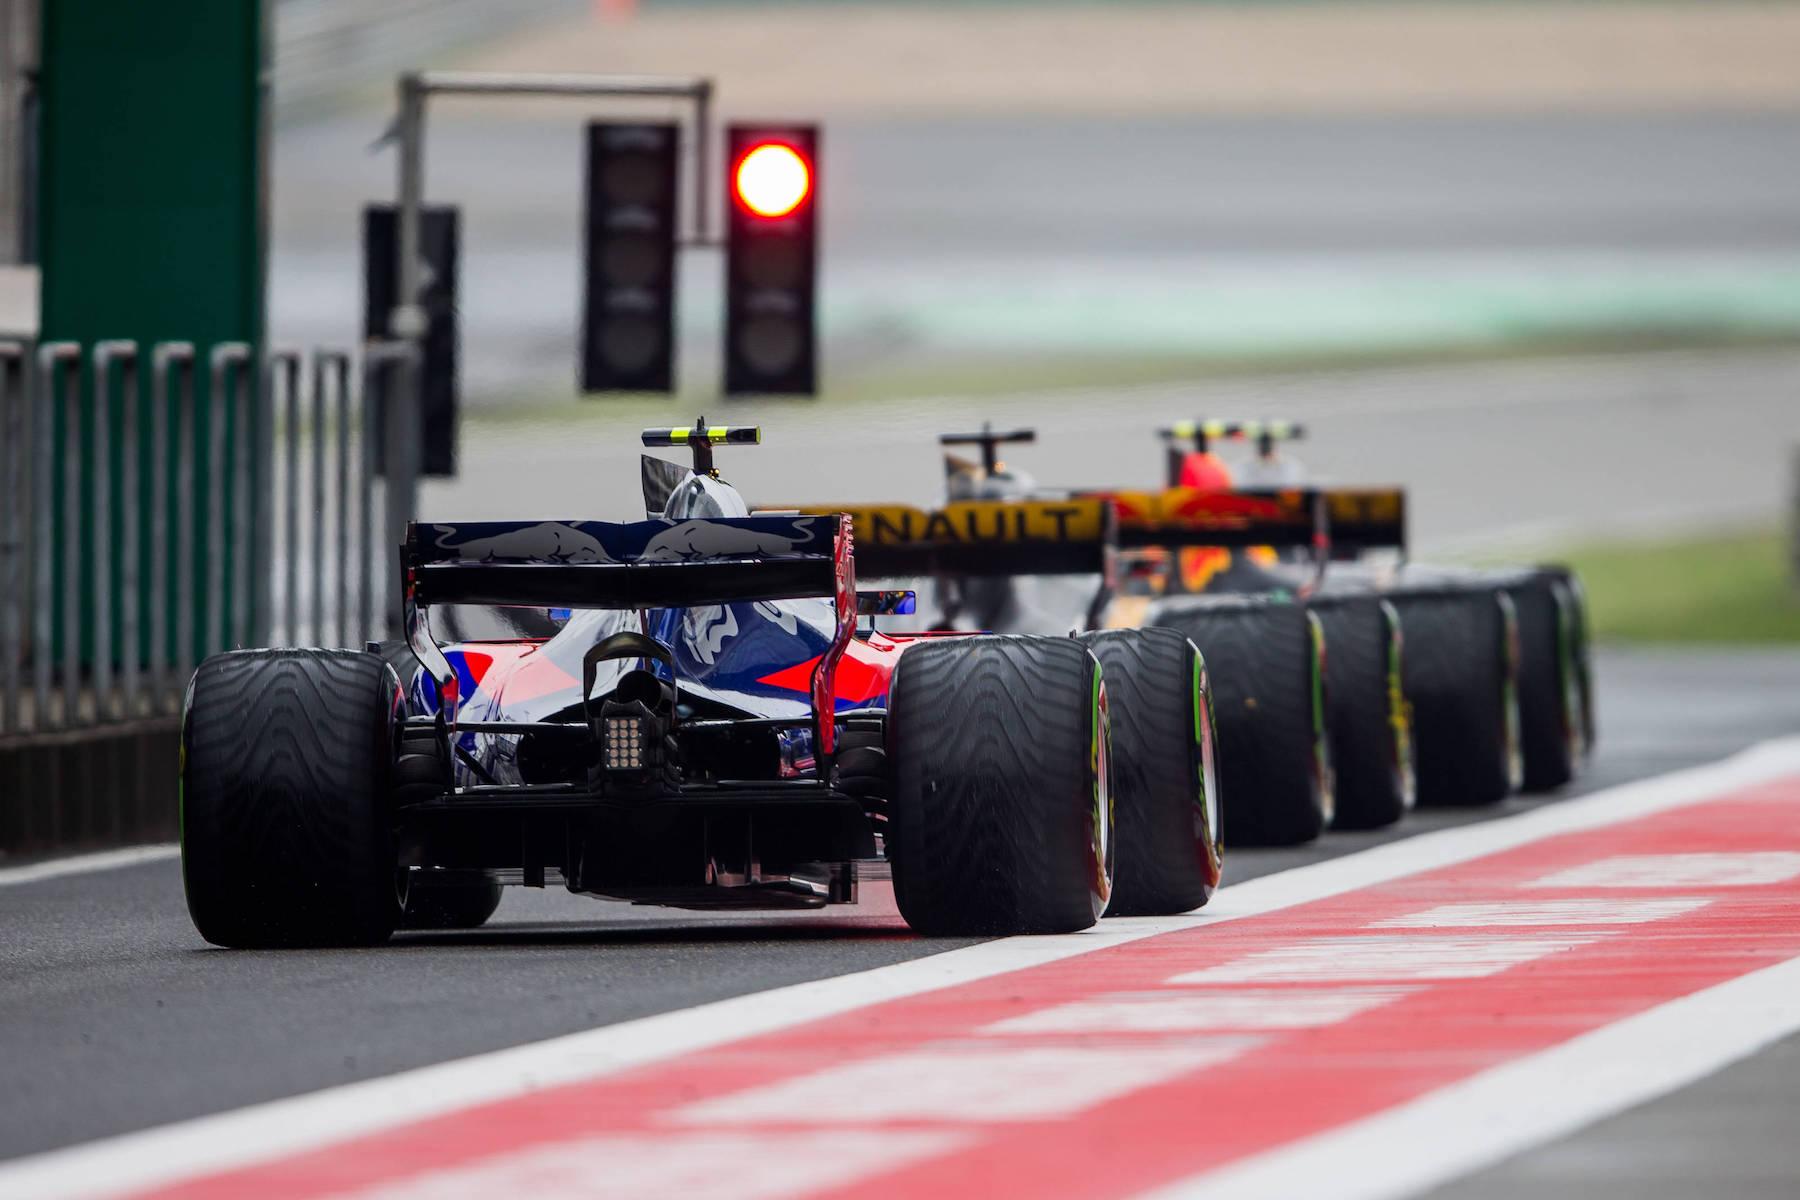 D 2017 Carlos Sainz | Toro Rosso STR12 | 2017 Chinese GP P7 1 copy.jpg